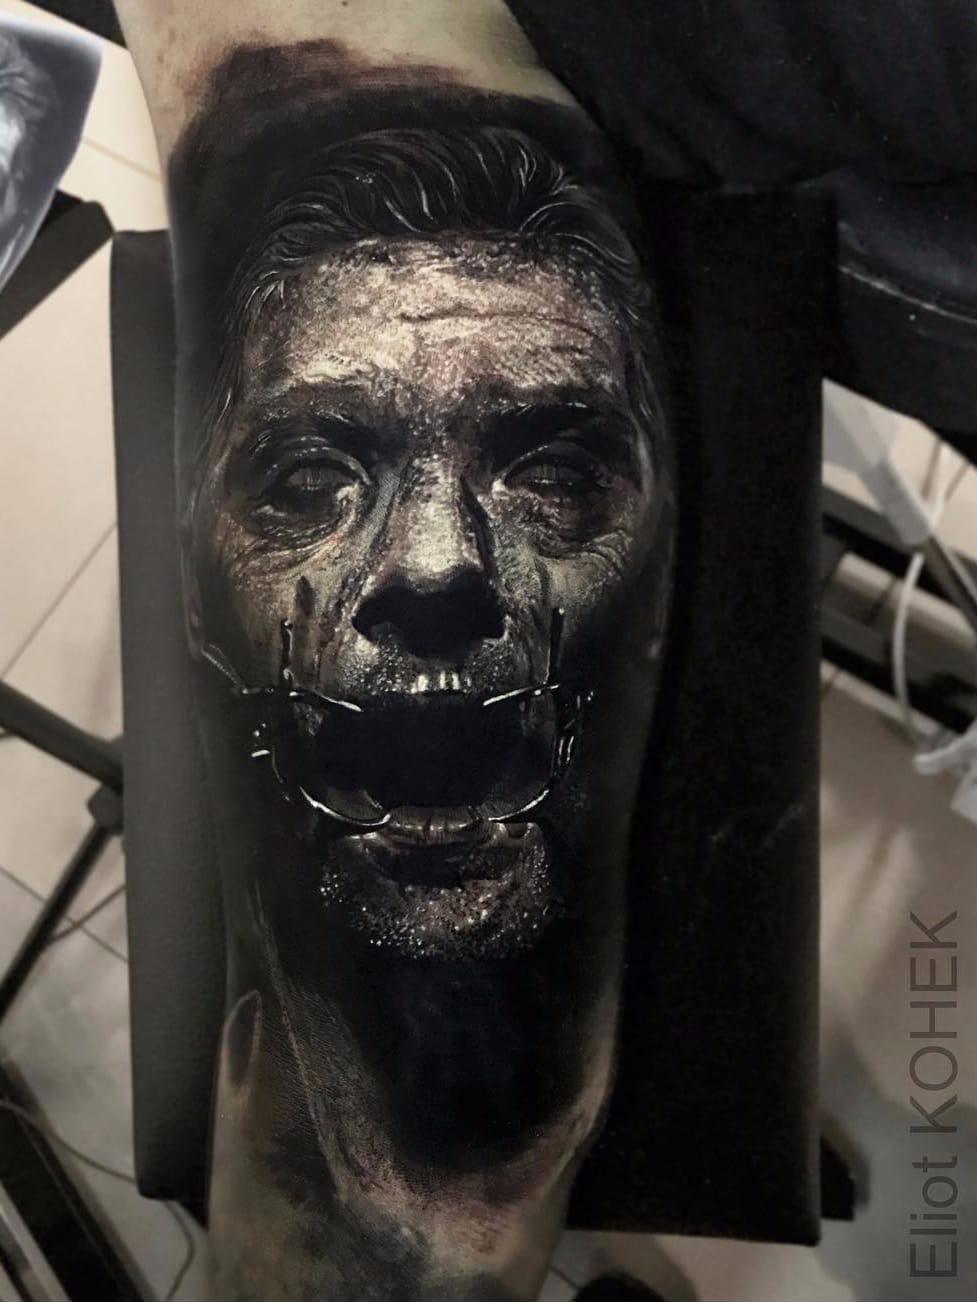 Por Eliot Kohek #EliotKohek #gringo #realismo #realism #pretoecinza #blackandgrey #man #homem #zombie #zumbi #dark #terror #horror #demon #demonio